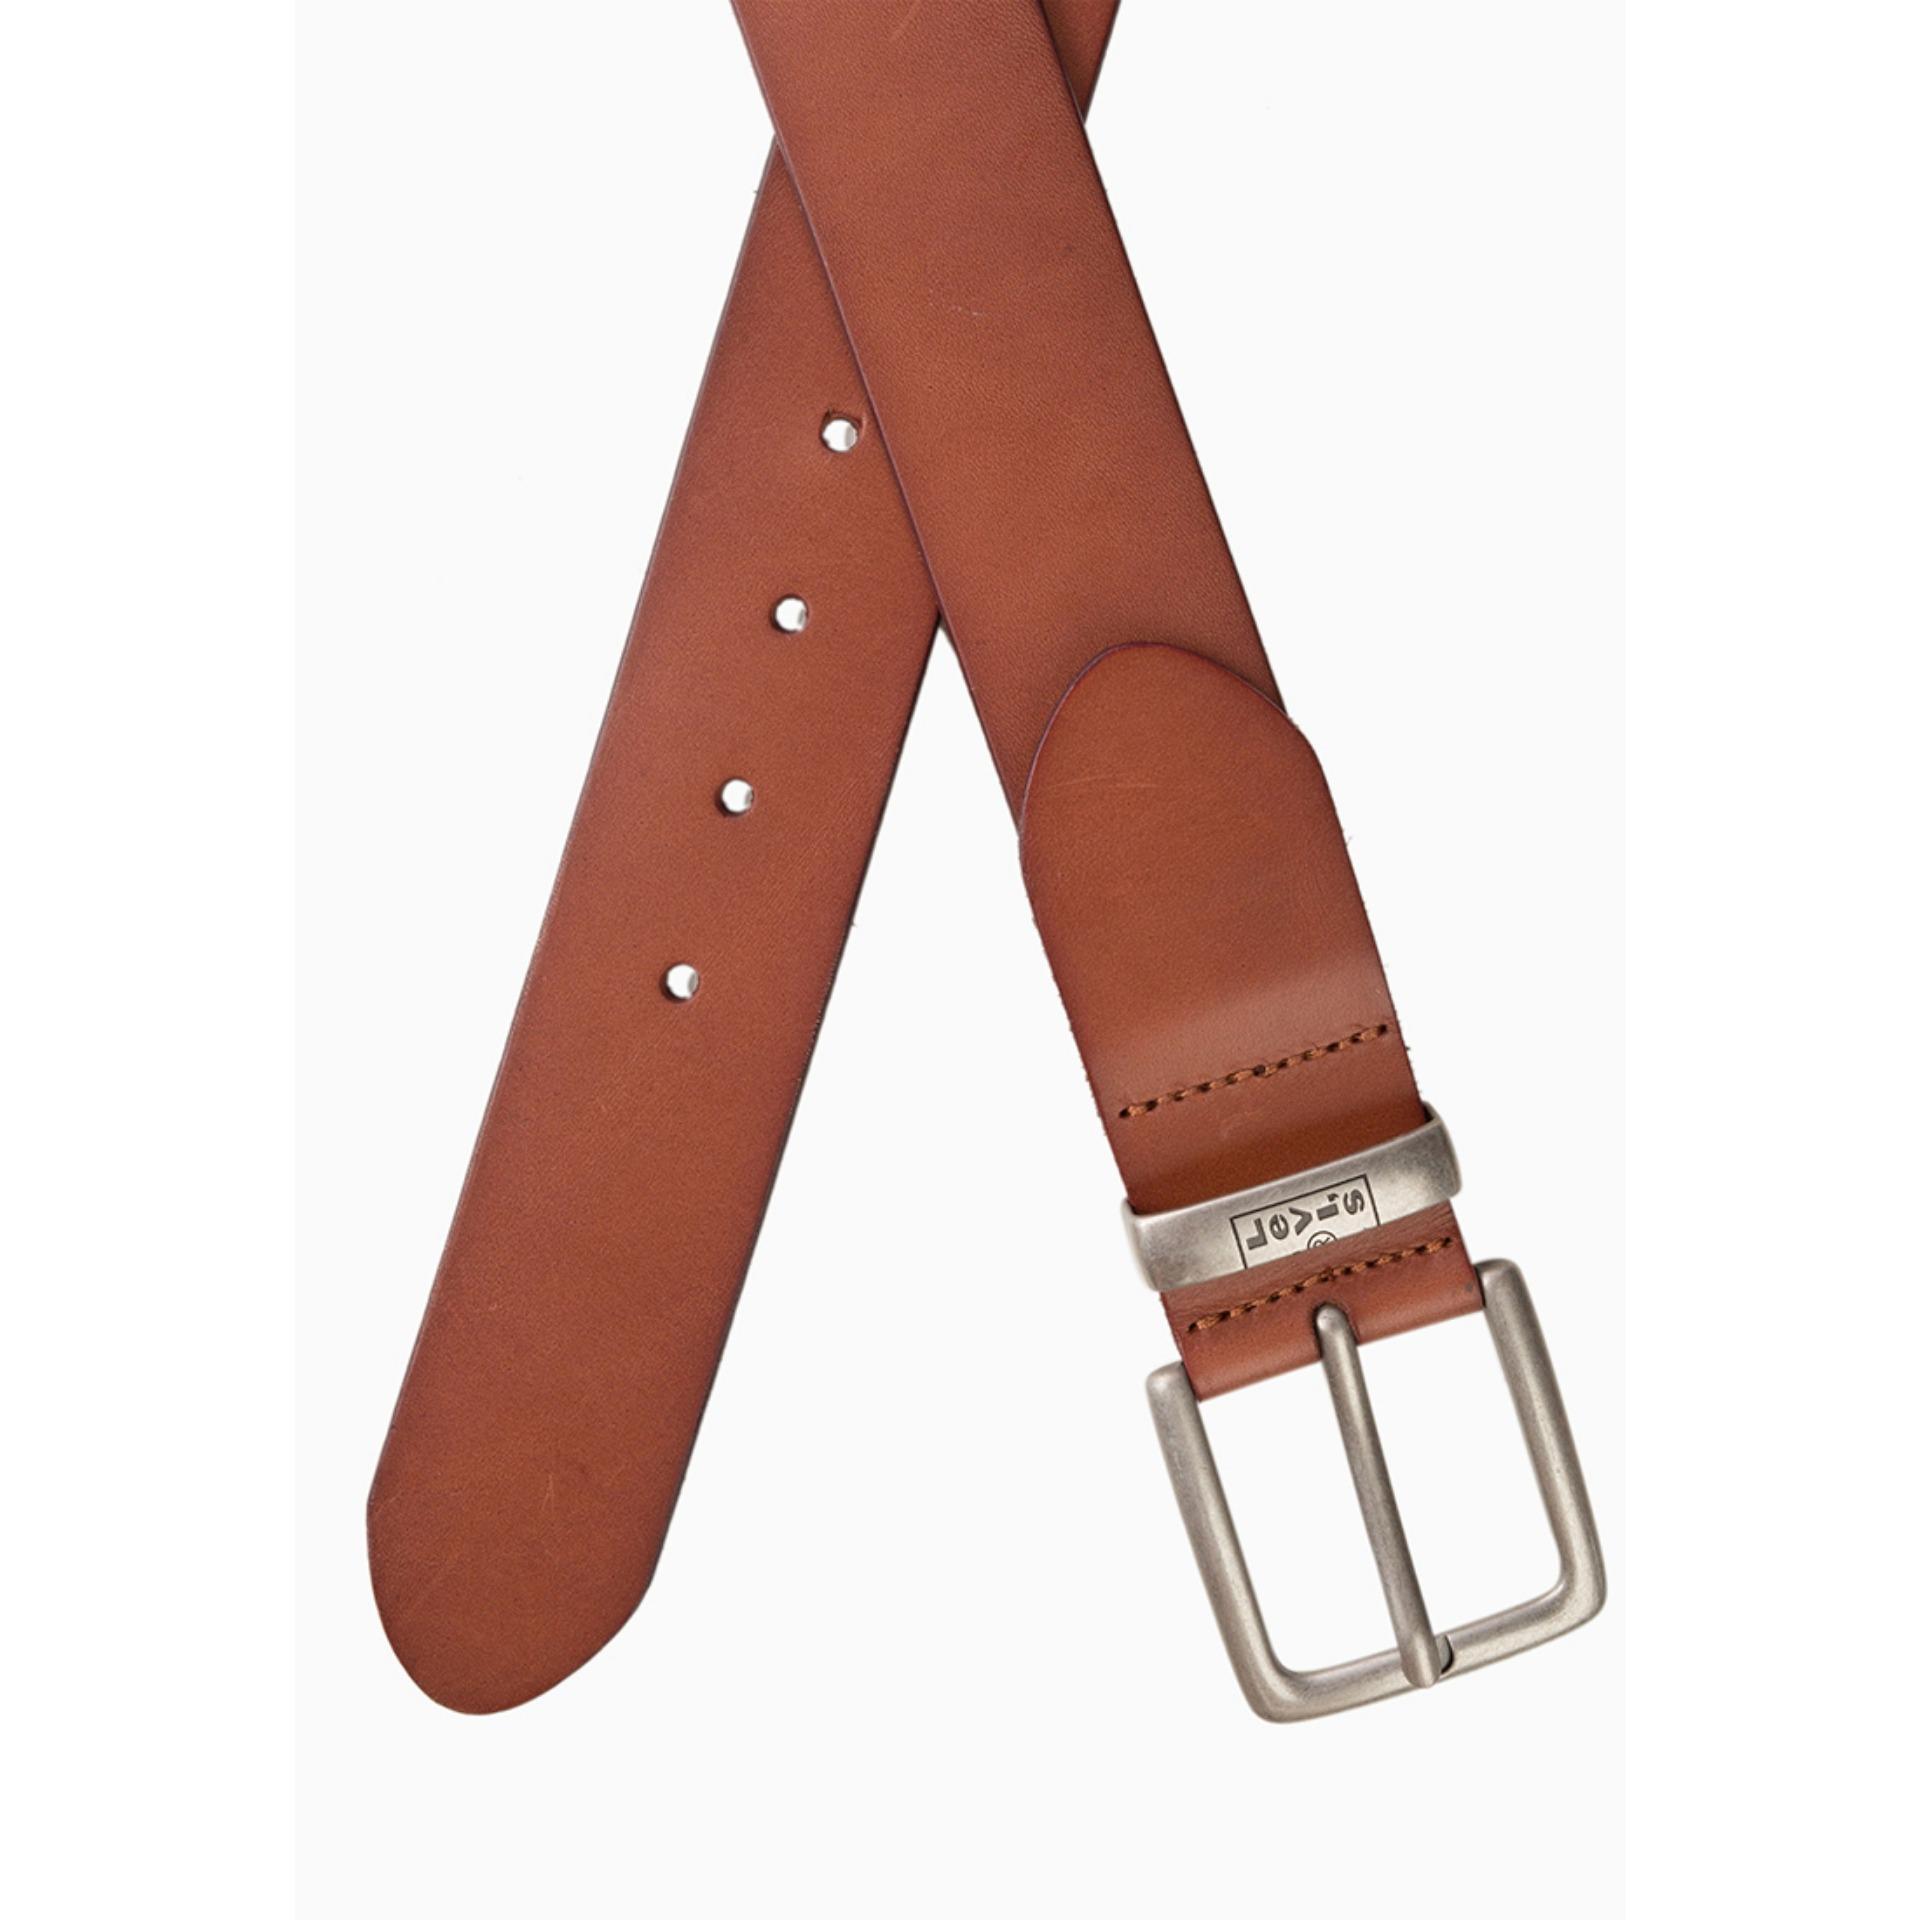 Eagle Genuine Leather Dompet Kulit 7891 Brown Daftar Harga Terkini Levis Belt Icon Light 77135 0734 Cokelat Muda Albert Medium 38016 0045 5